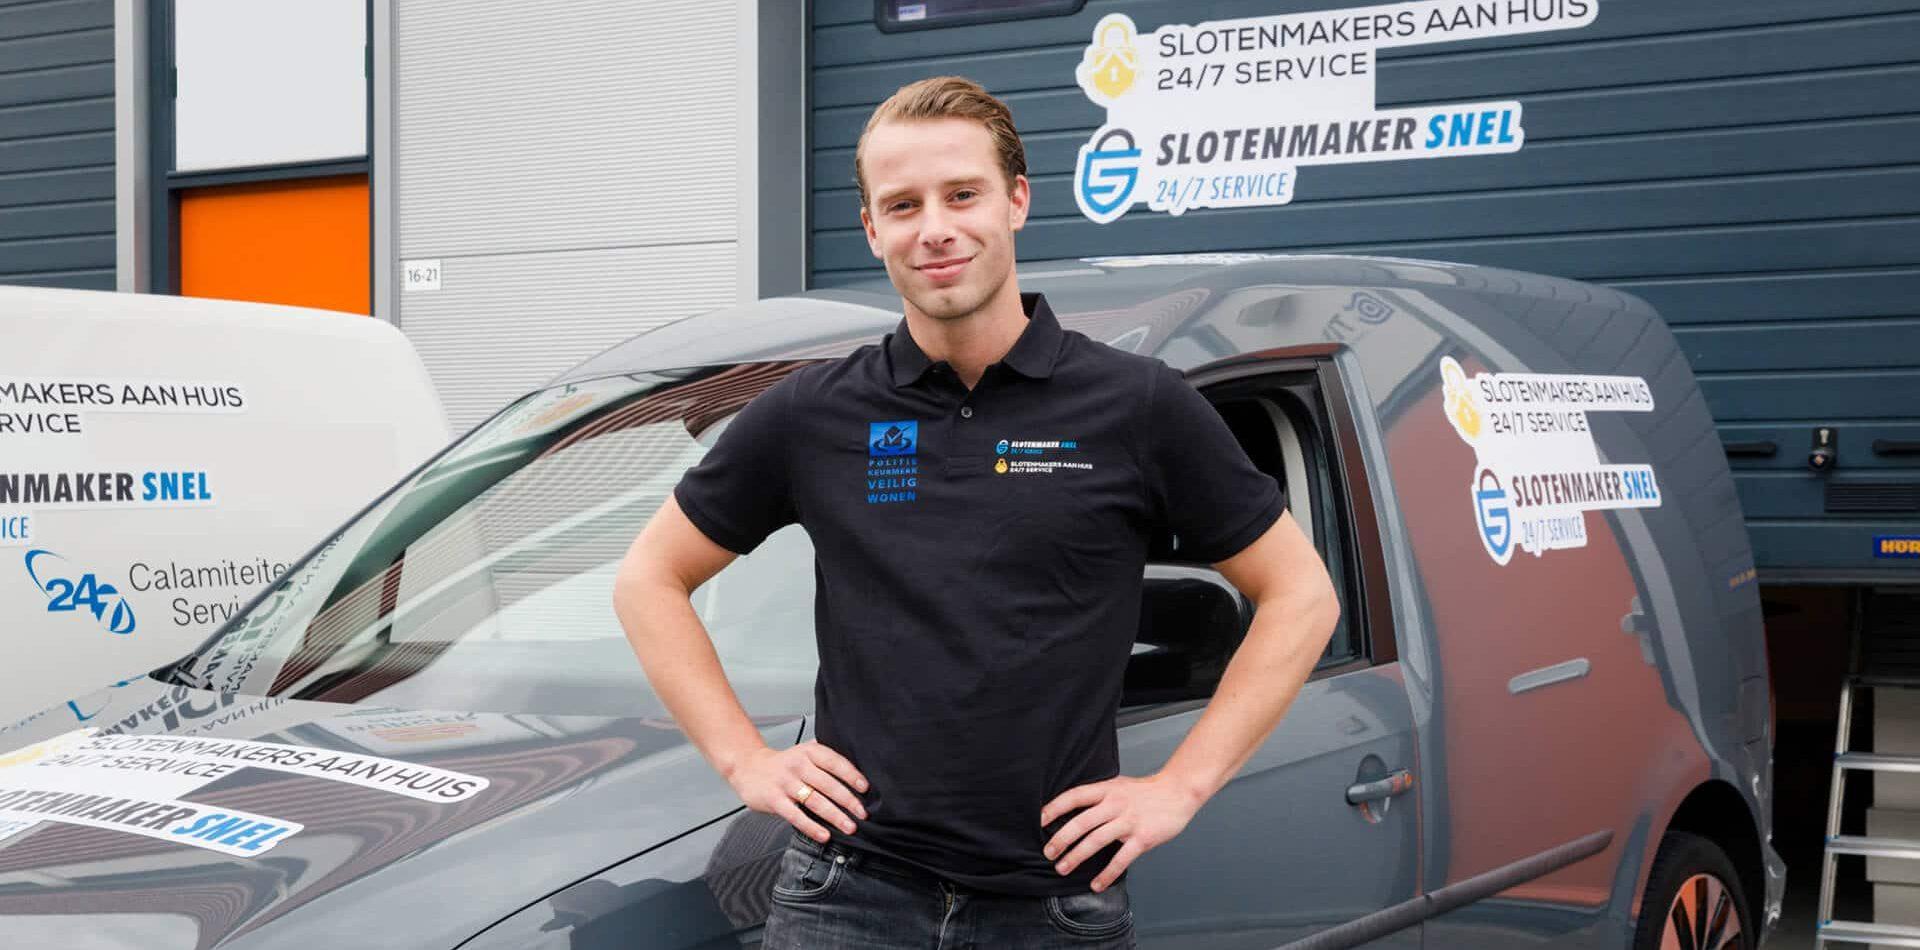 Slotenmaker Vianen